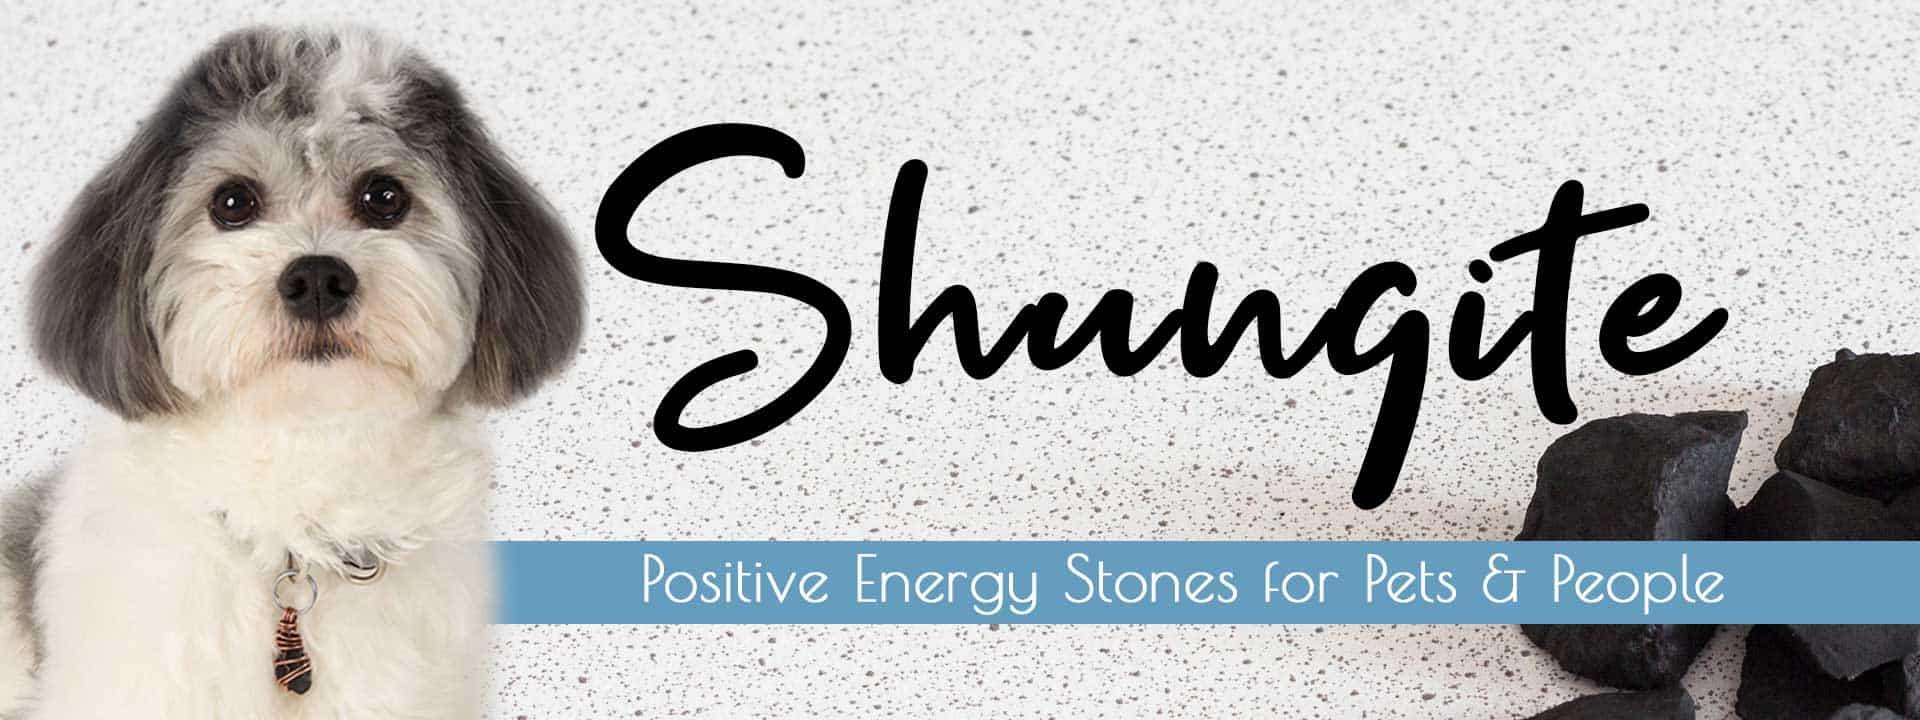 shungite-pendants-nuggets-healing-stone